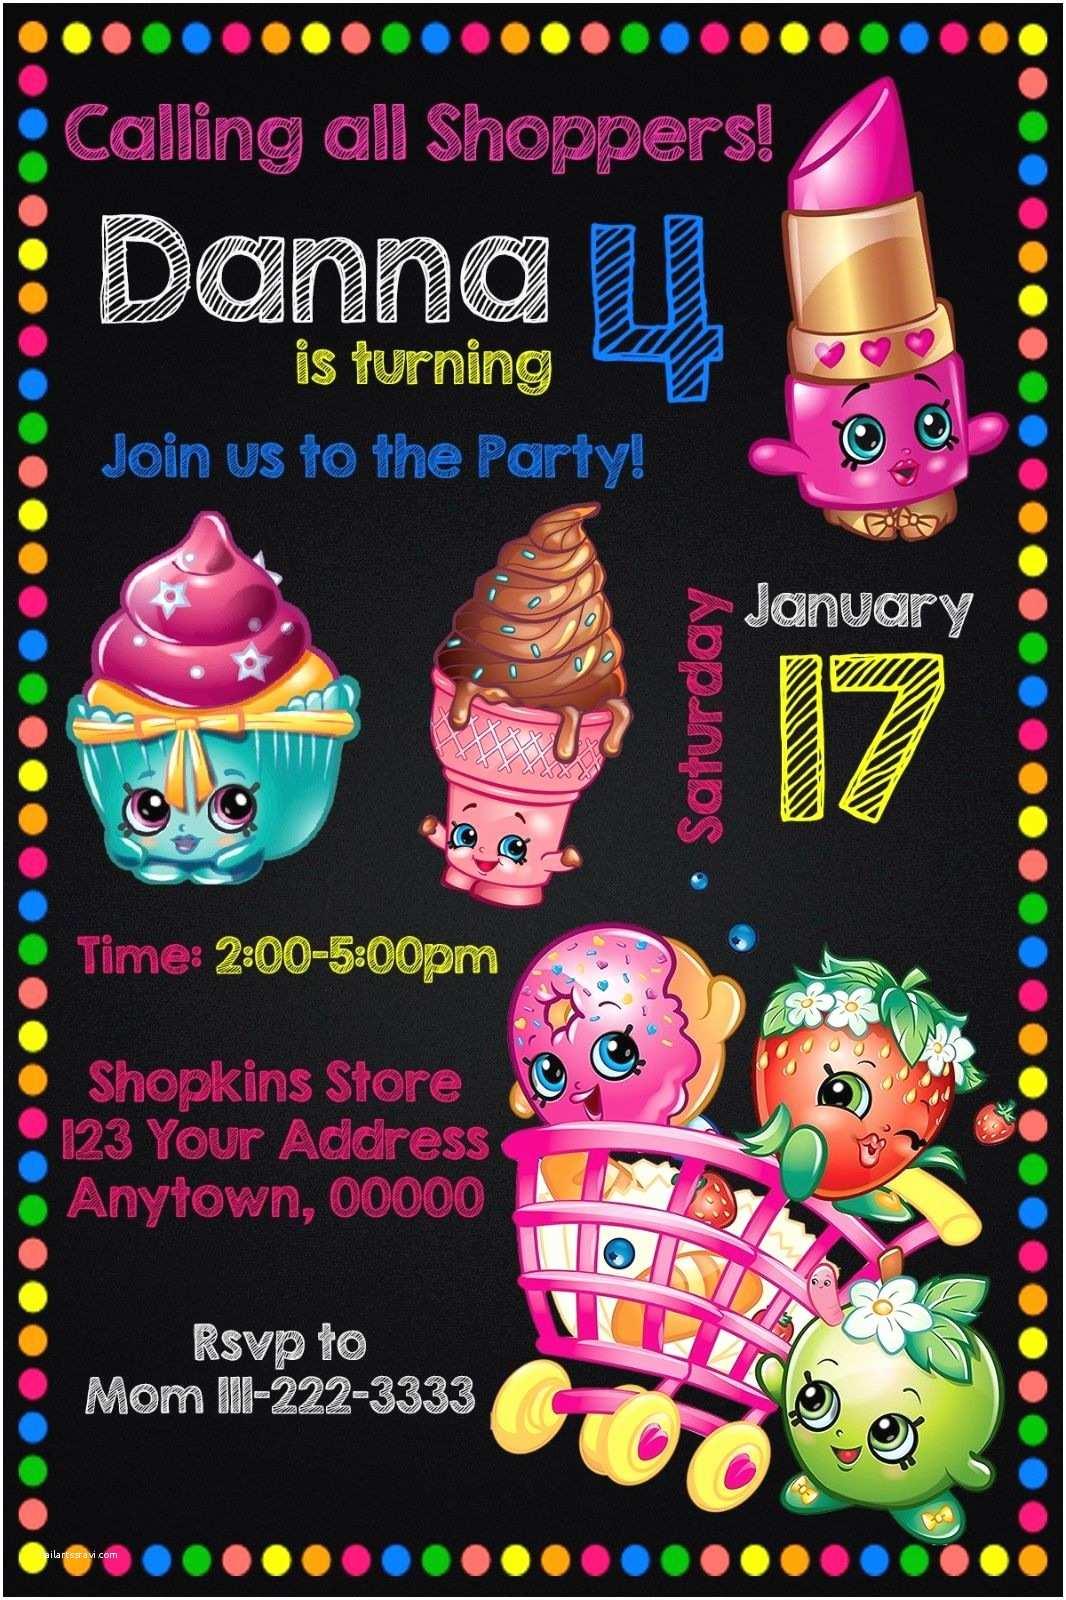 Customized Birthday Invitations 12 Shopkins Birthday Party Invitations Personalized Custom